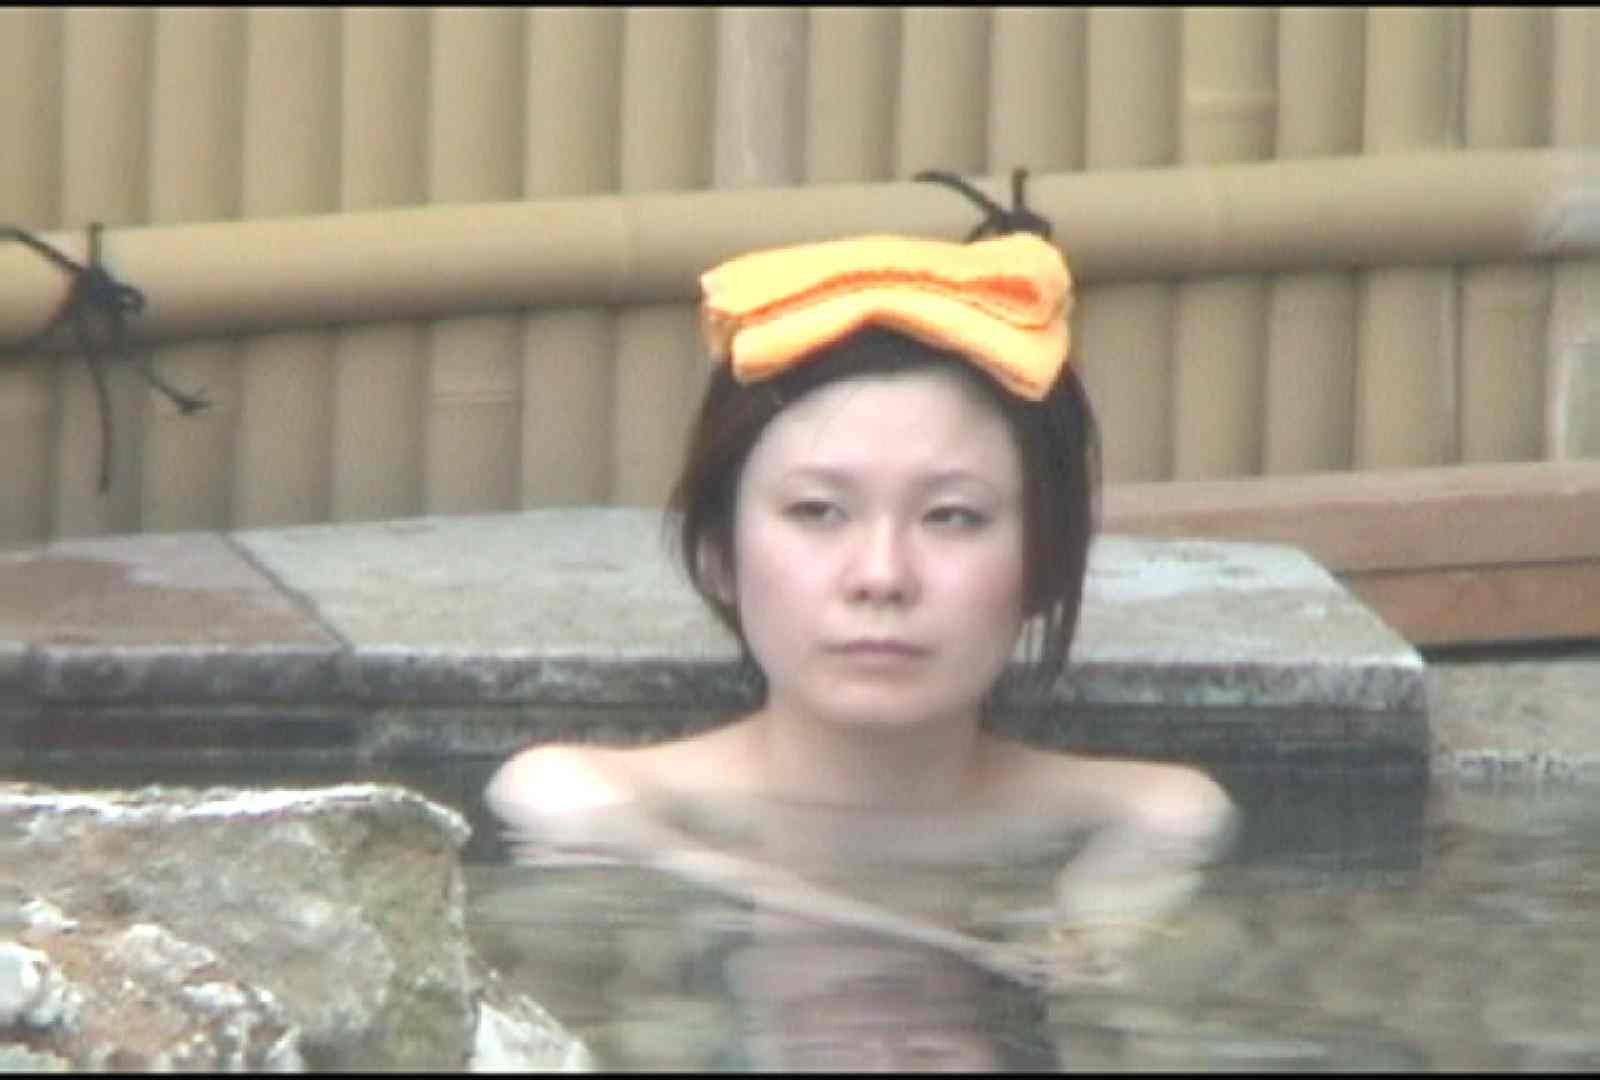 Aquaな露天風呂Vol.177 盗撮師作品  102pic 54